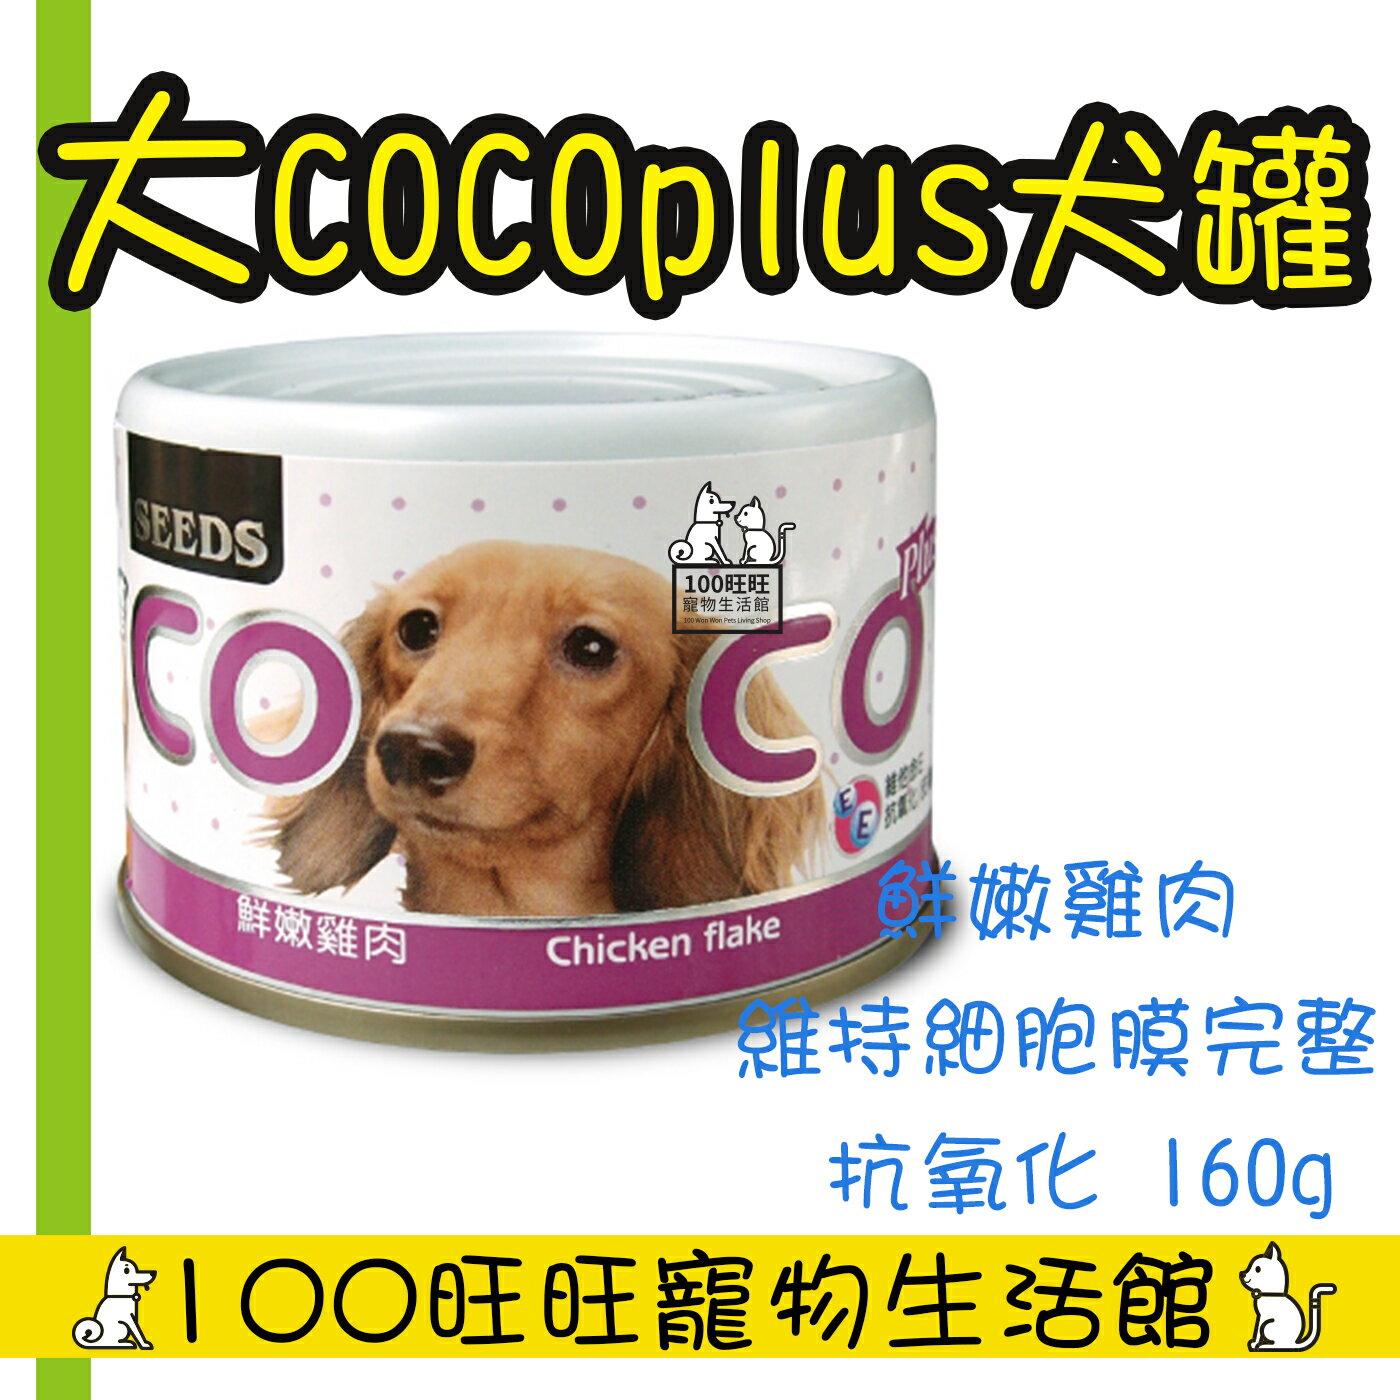 SEEDS 聖萊西 惜時 COCO Plus 愛犬機能餐罐 大COCO 160g 單罐